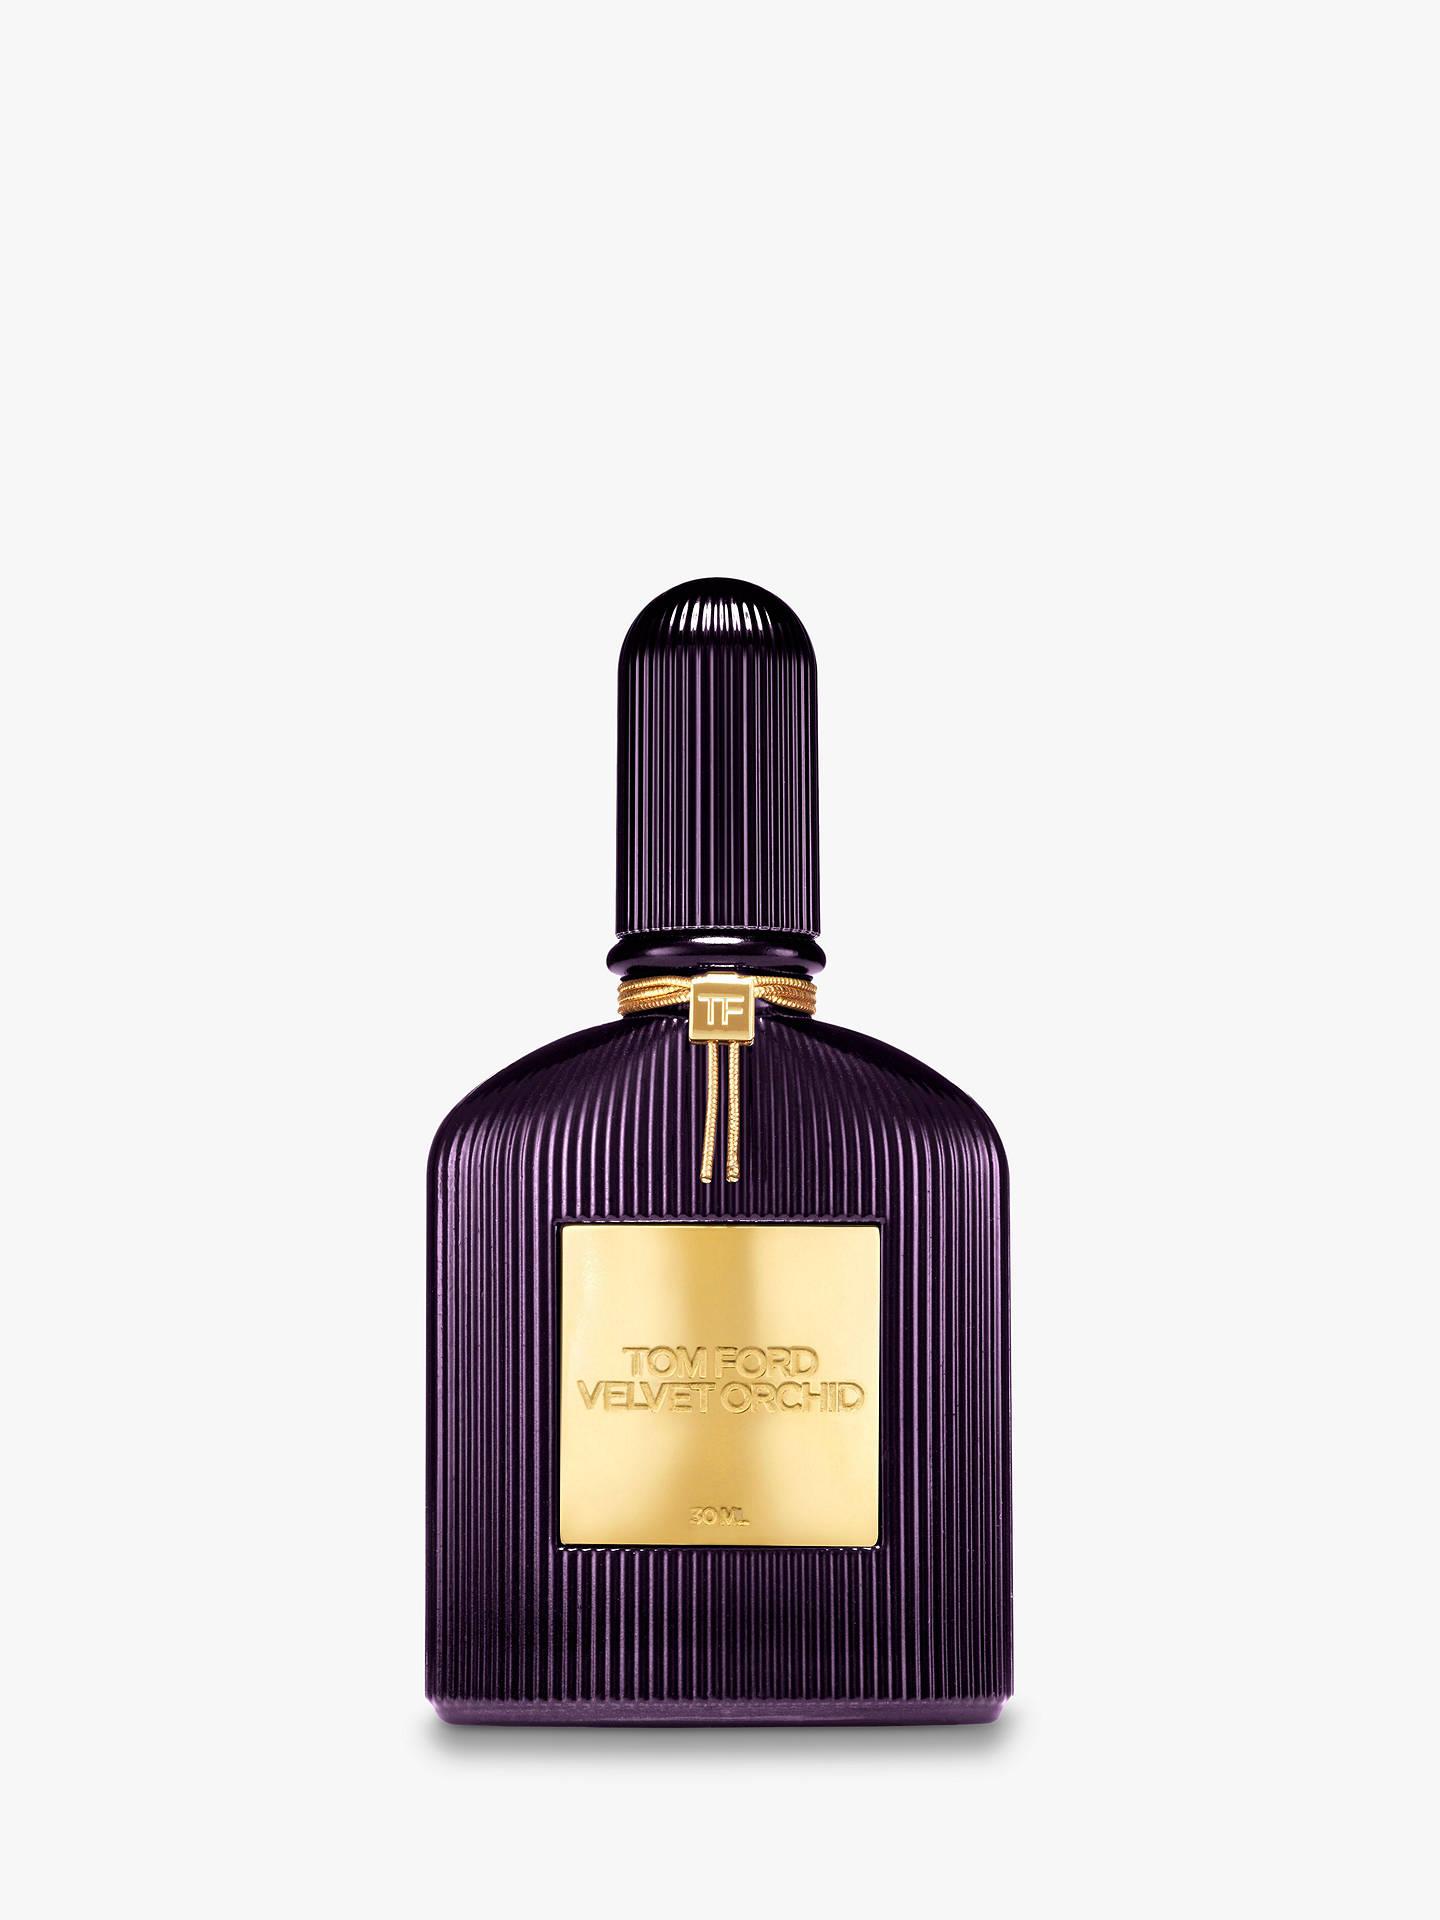 4be008f18 Homepage · Beauty · Women s Fragrance. Buy TOM FORD Velvet Orchid Eau de  Parfum